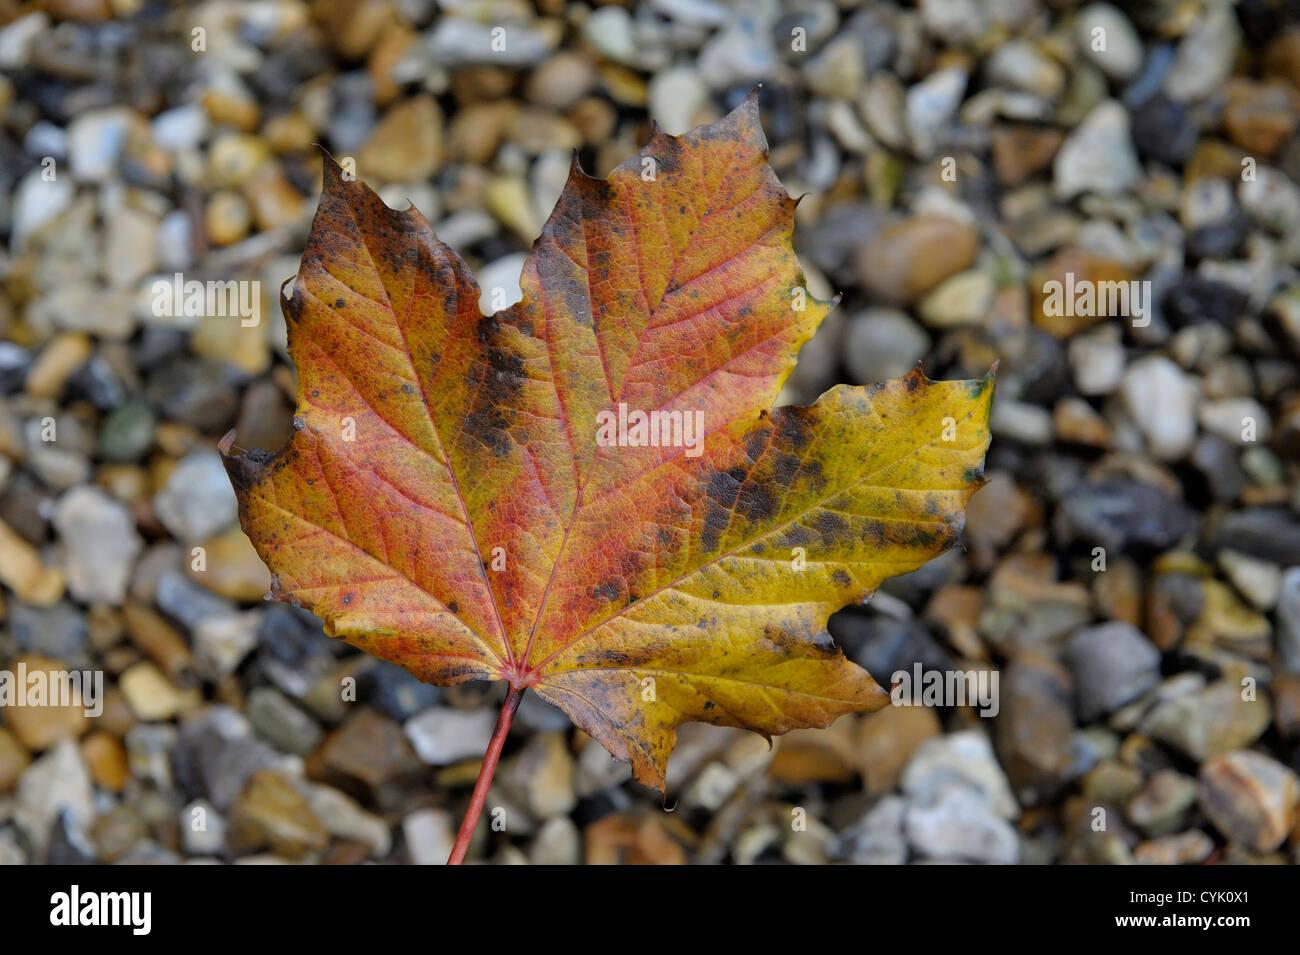 one reddish brown autumnal leaf on stony background - Stock Image